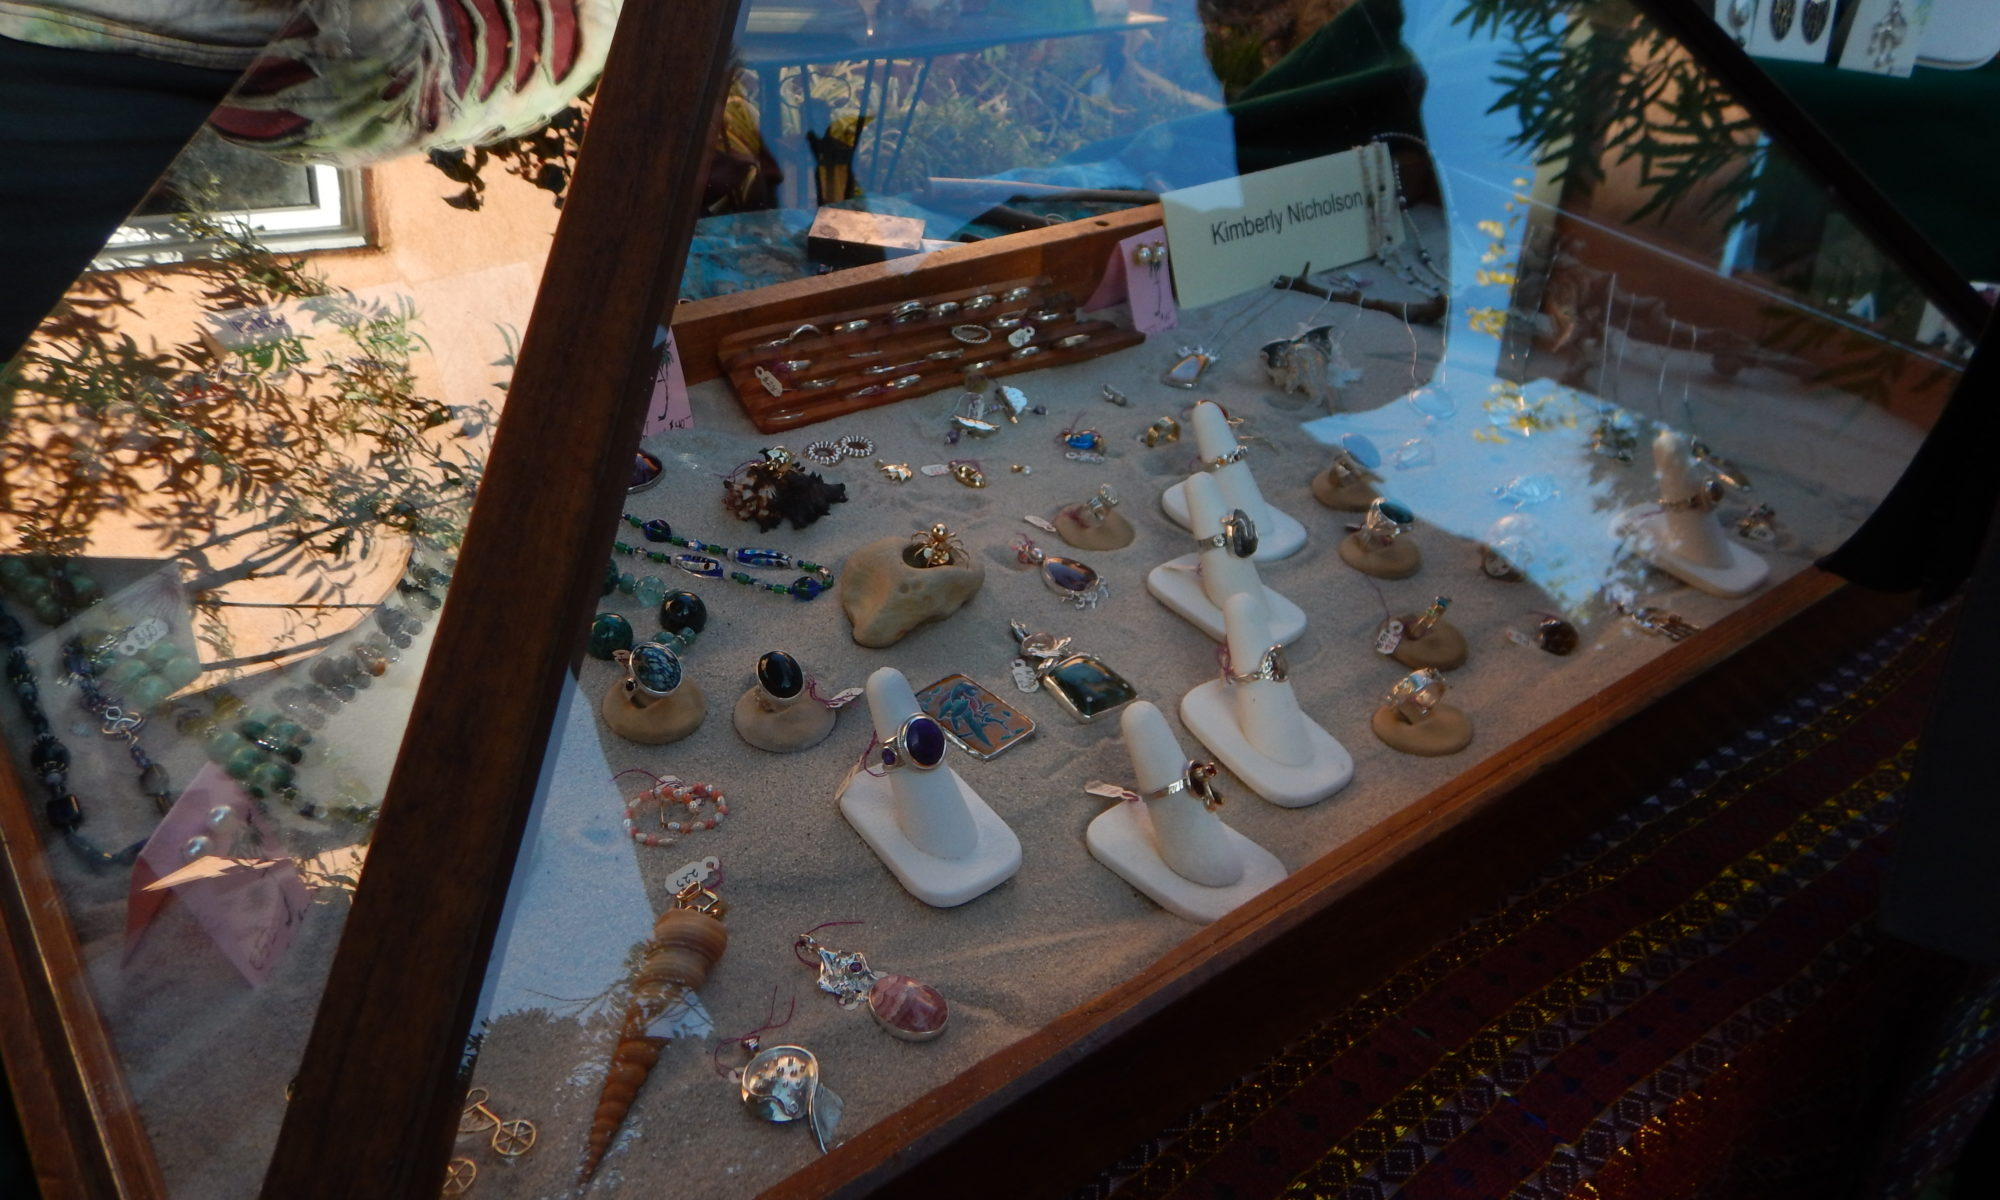 Custom Jewelry Made By Kimberly J Munson Nicholson